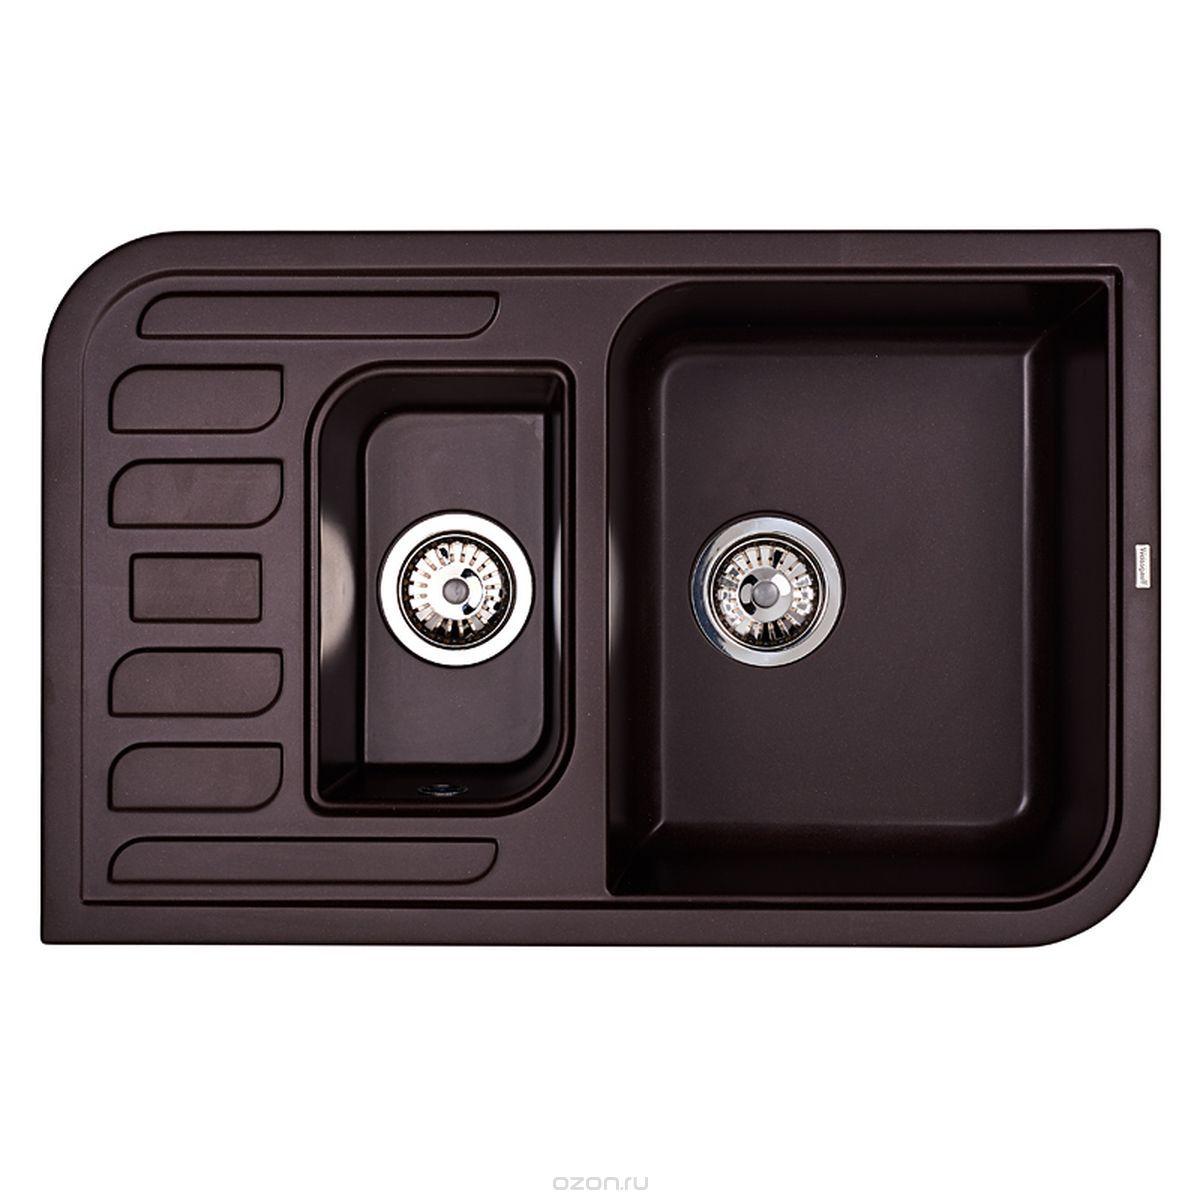 Кухонная мойка Weissgauff SOFTLINE 780 Eco Granit шоколад